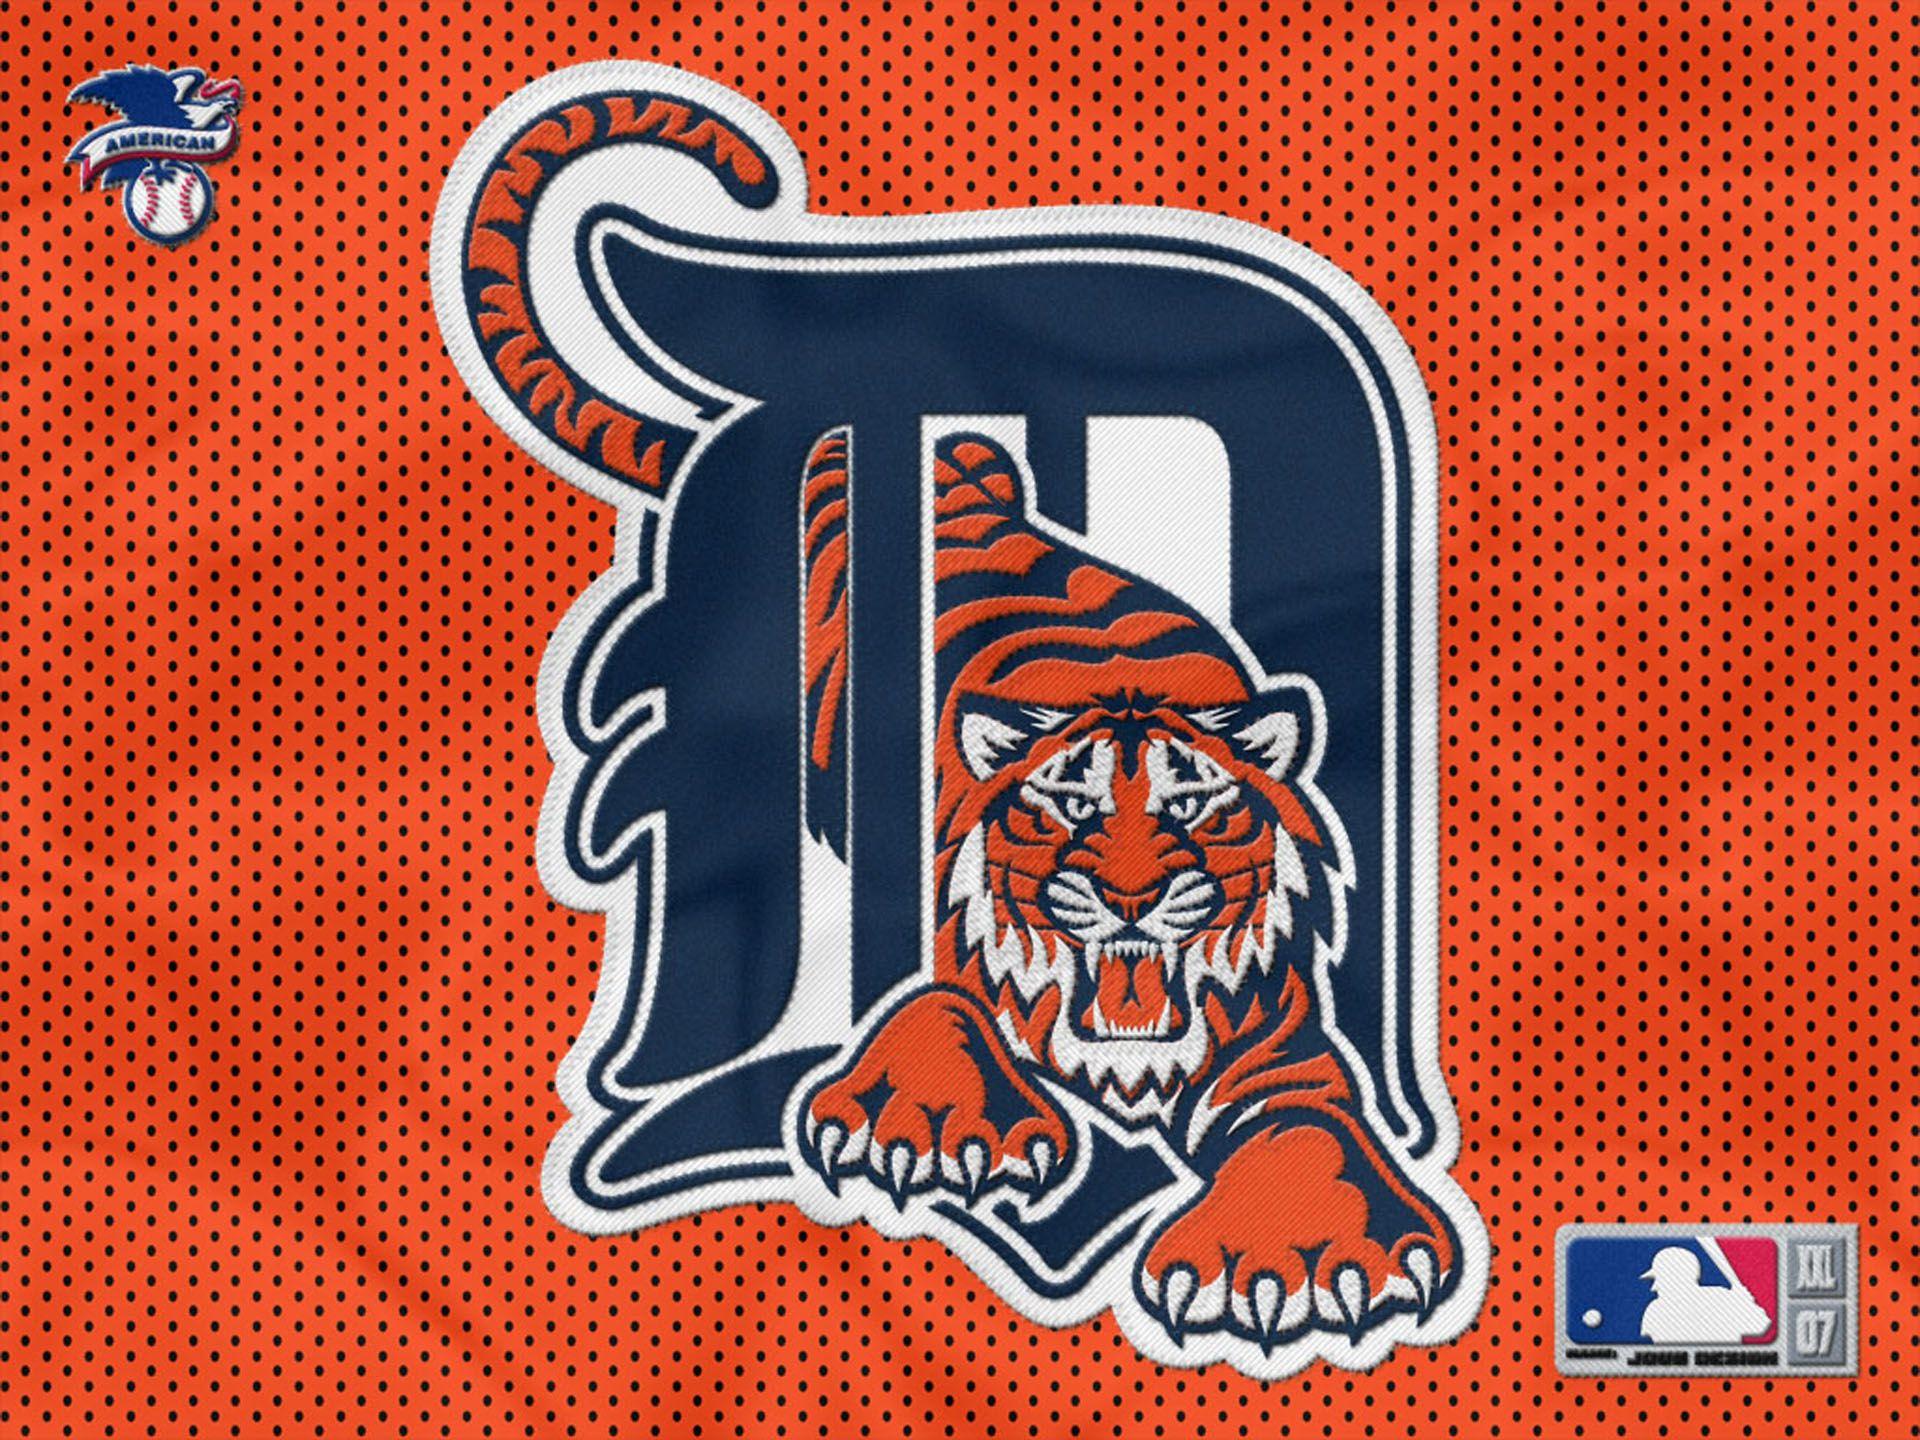 Detroit Tigers Wallpaper 8 Jpg 1920 1440 Detroit Tigers Detroit Detroit Tigers Tickets